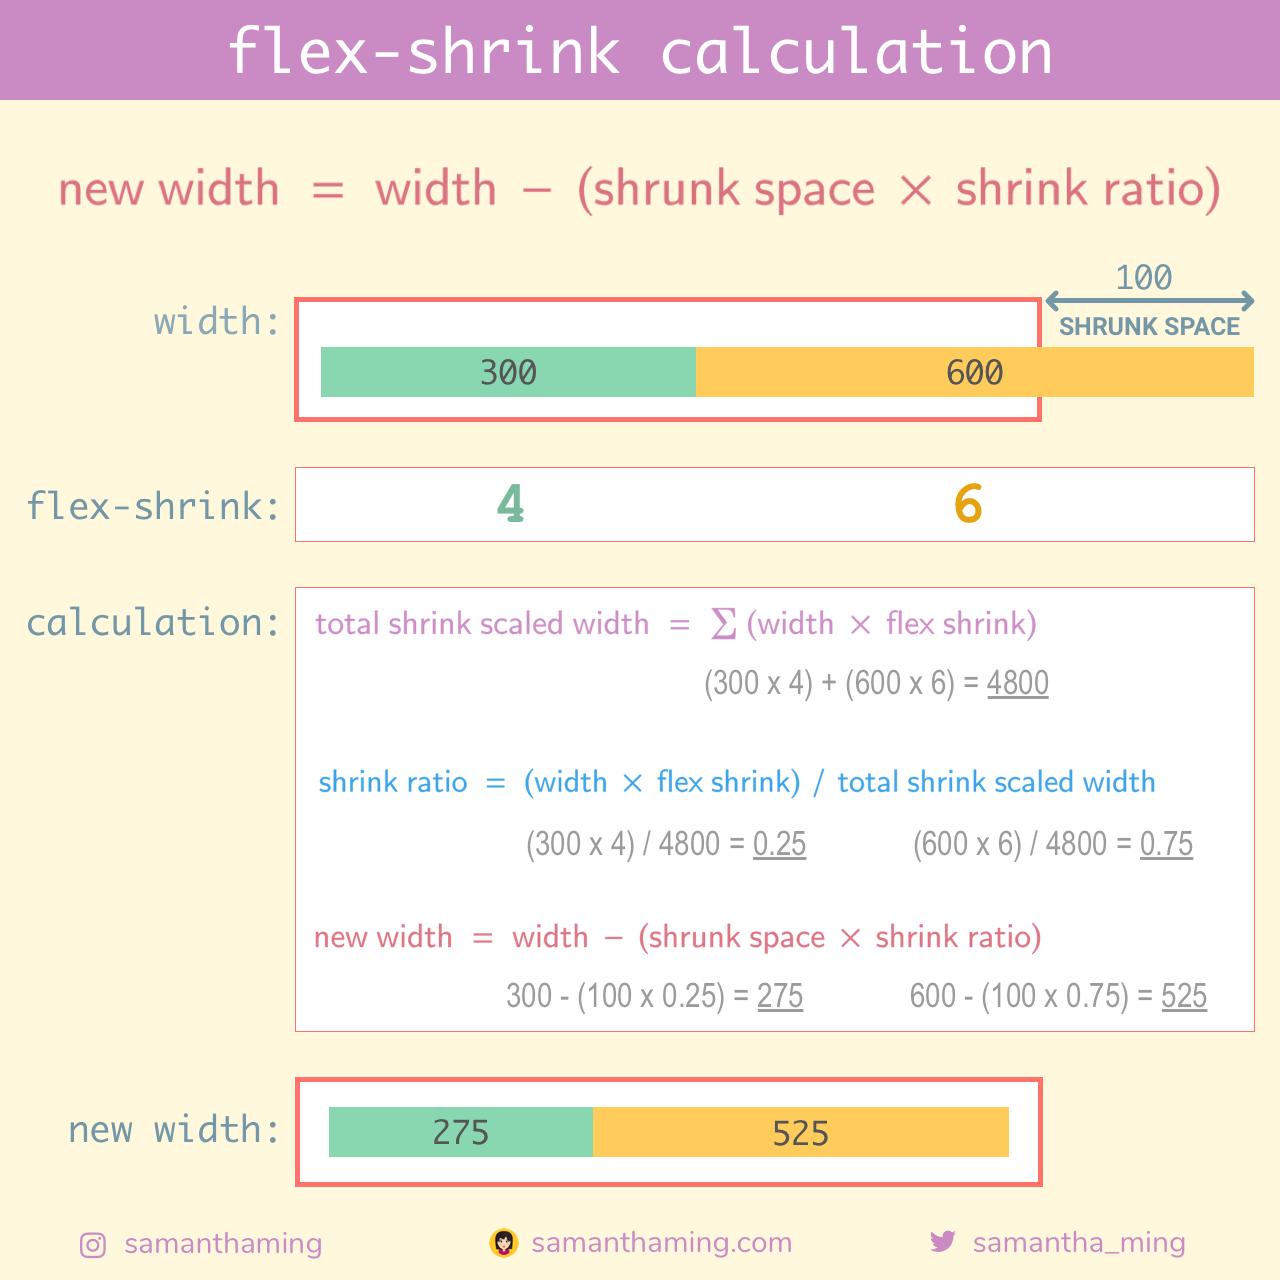 flex-shrink calculation